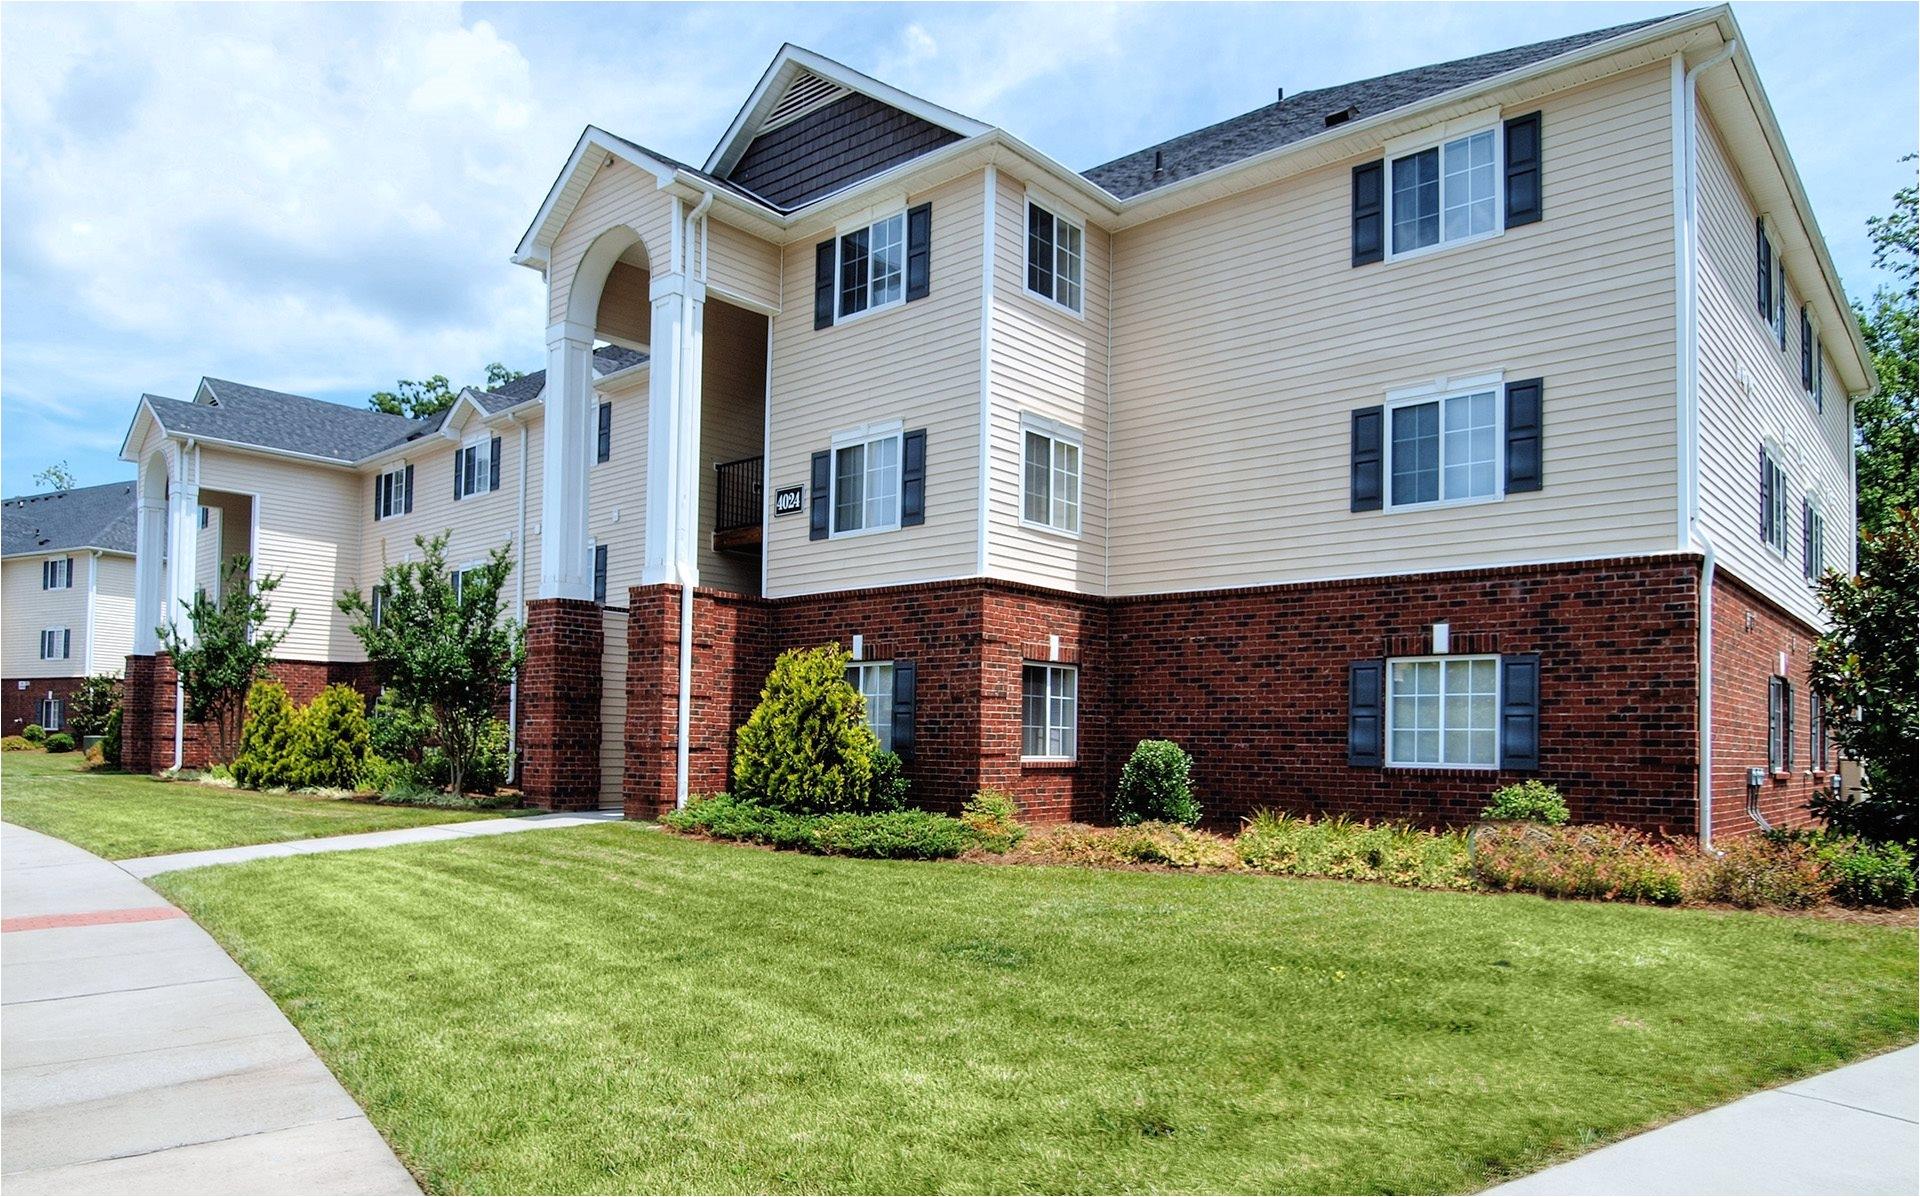 beautiful brick construction battleground north apartments in greensboro nc